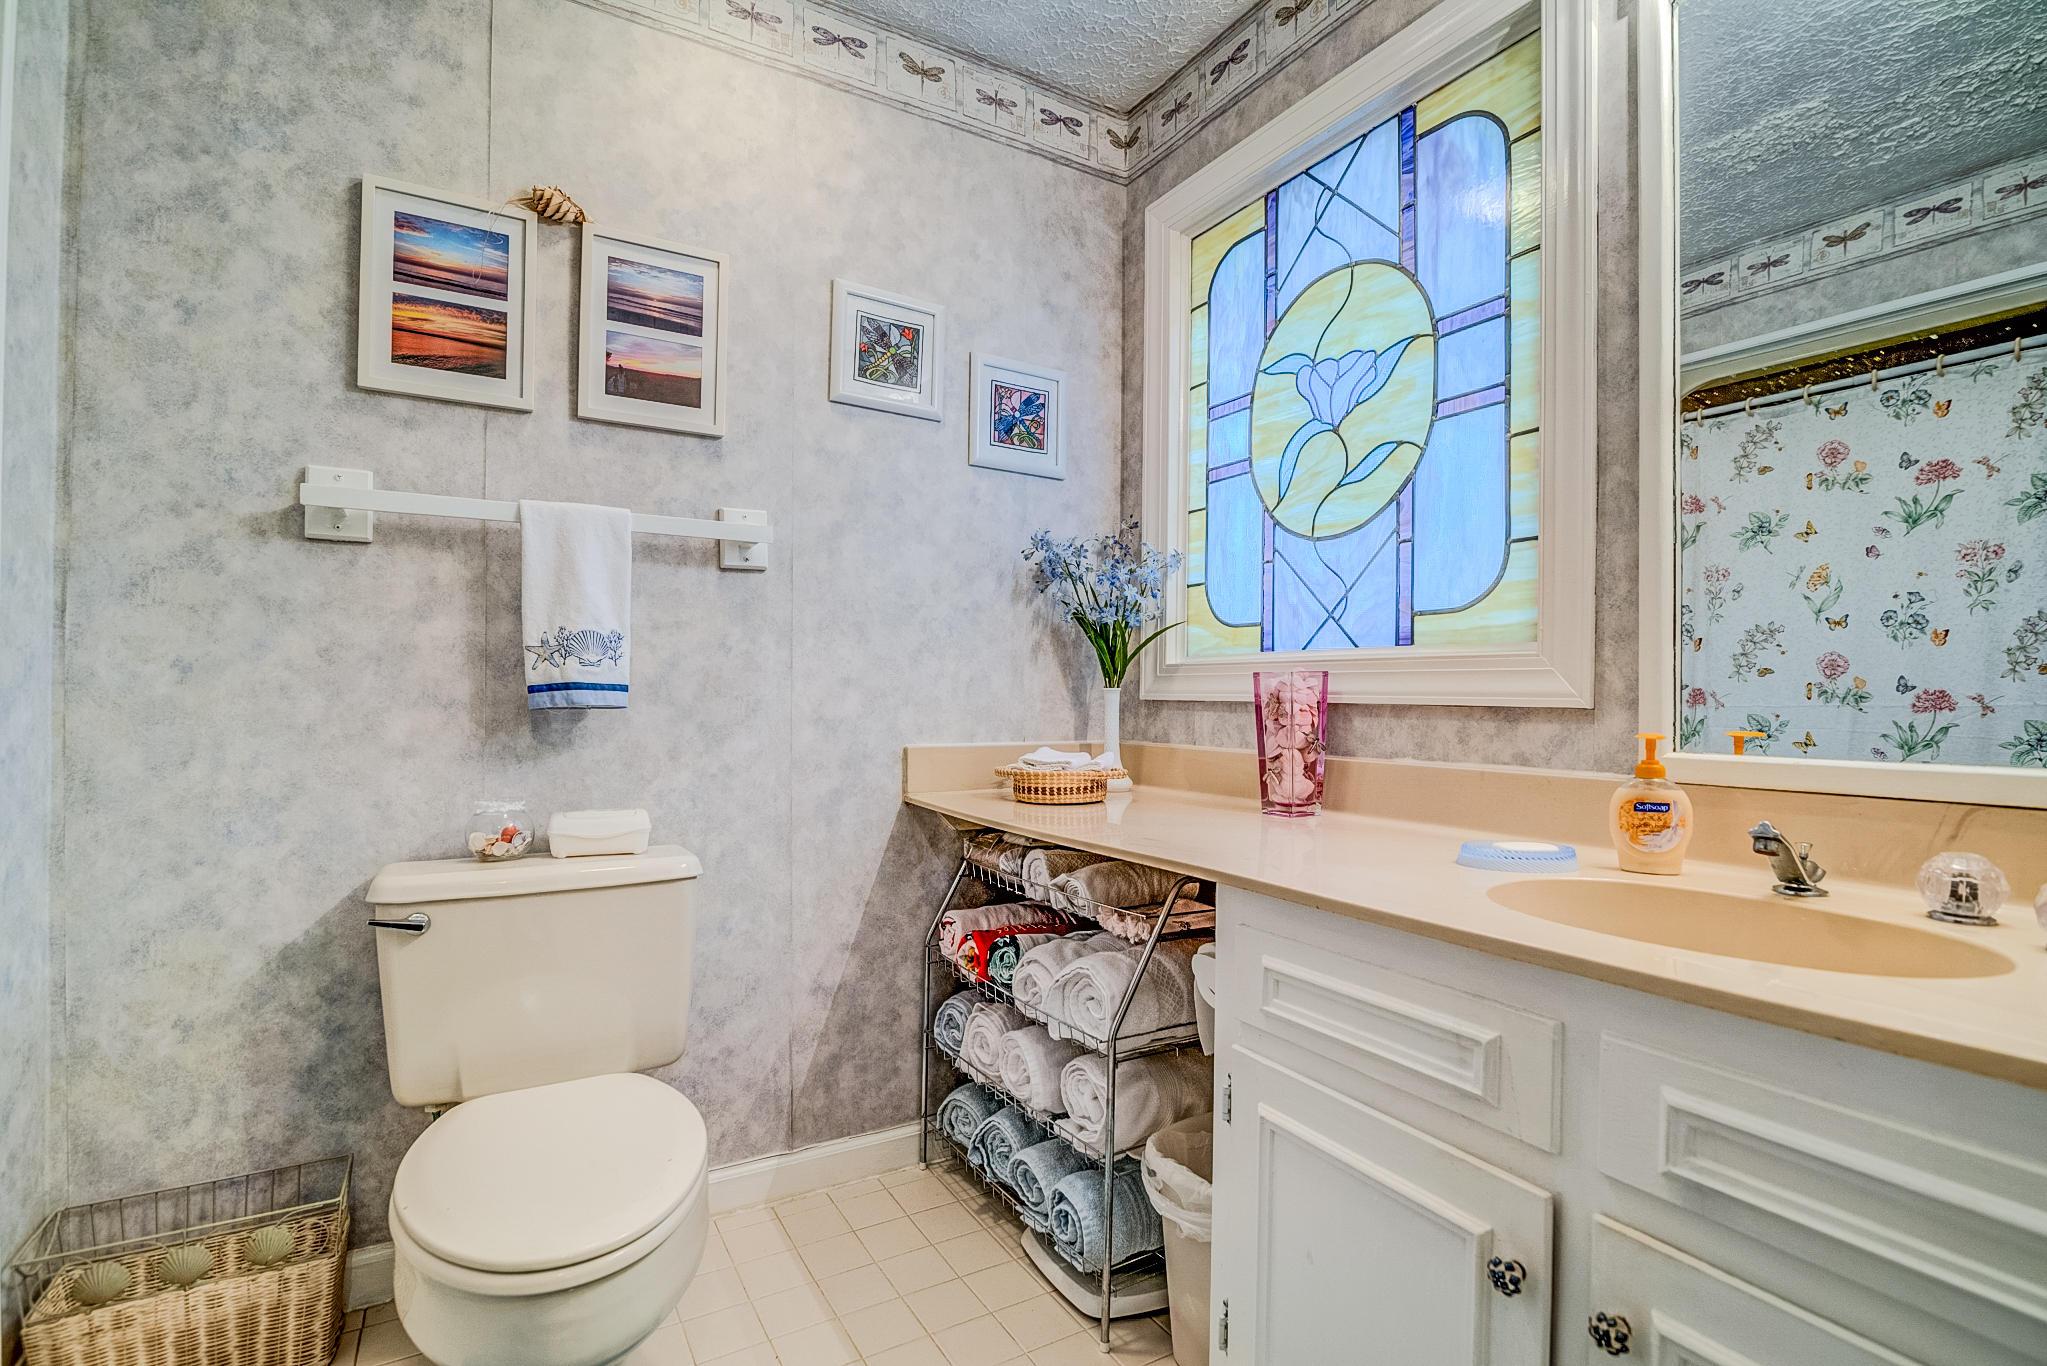 Bay Pointe Villas Homes For Sale - 2127 Landfall, Johns Island, SC - 1